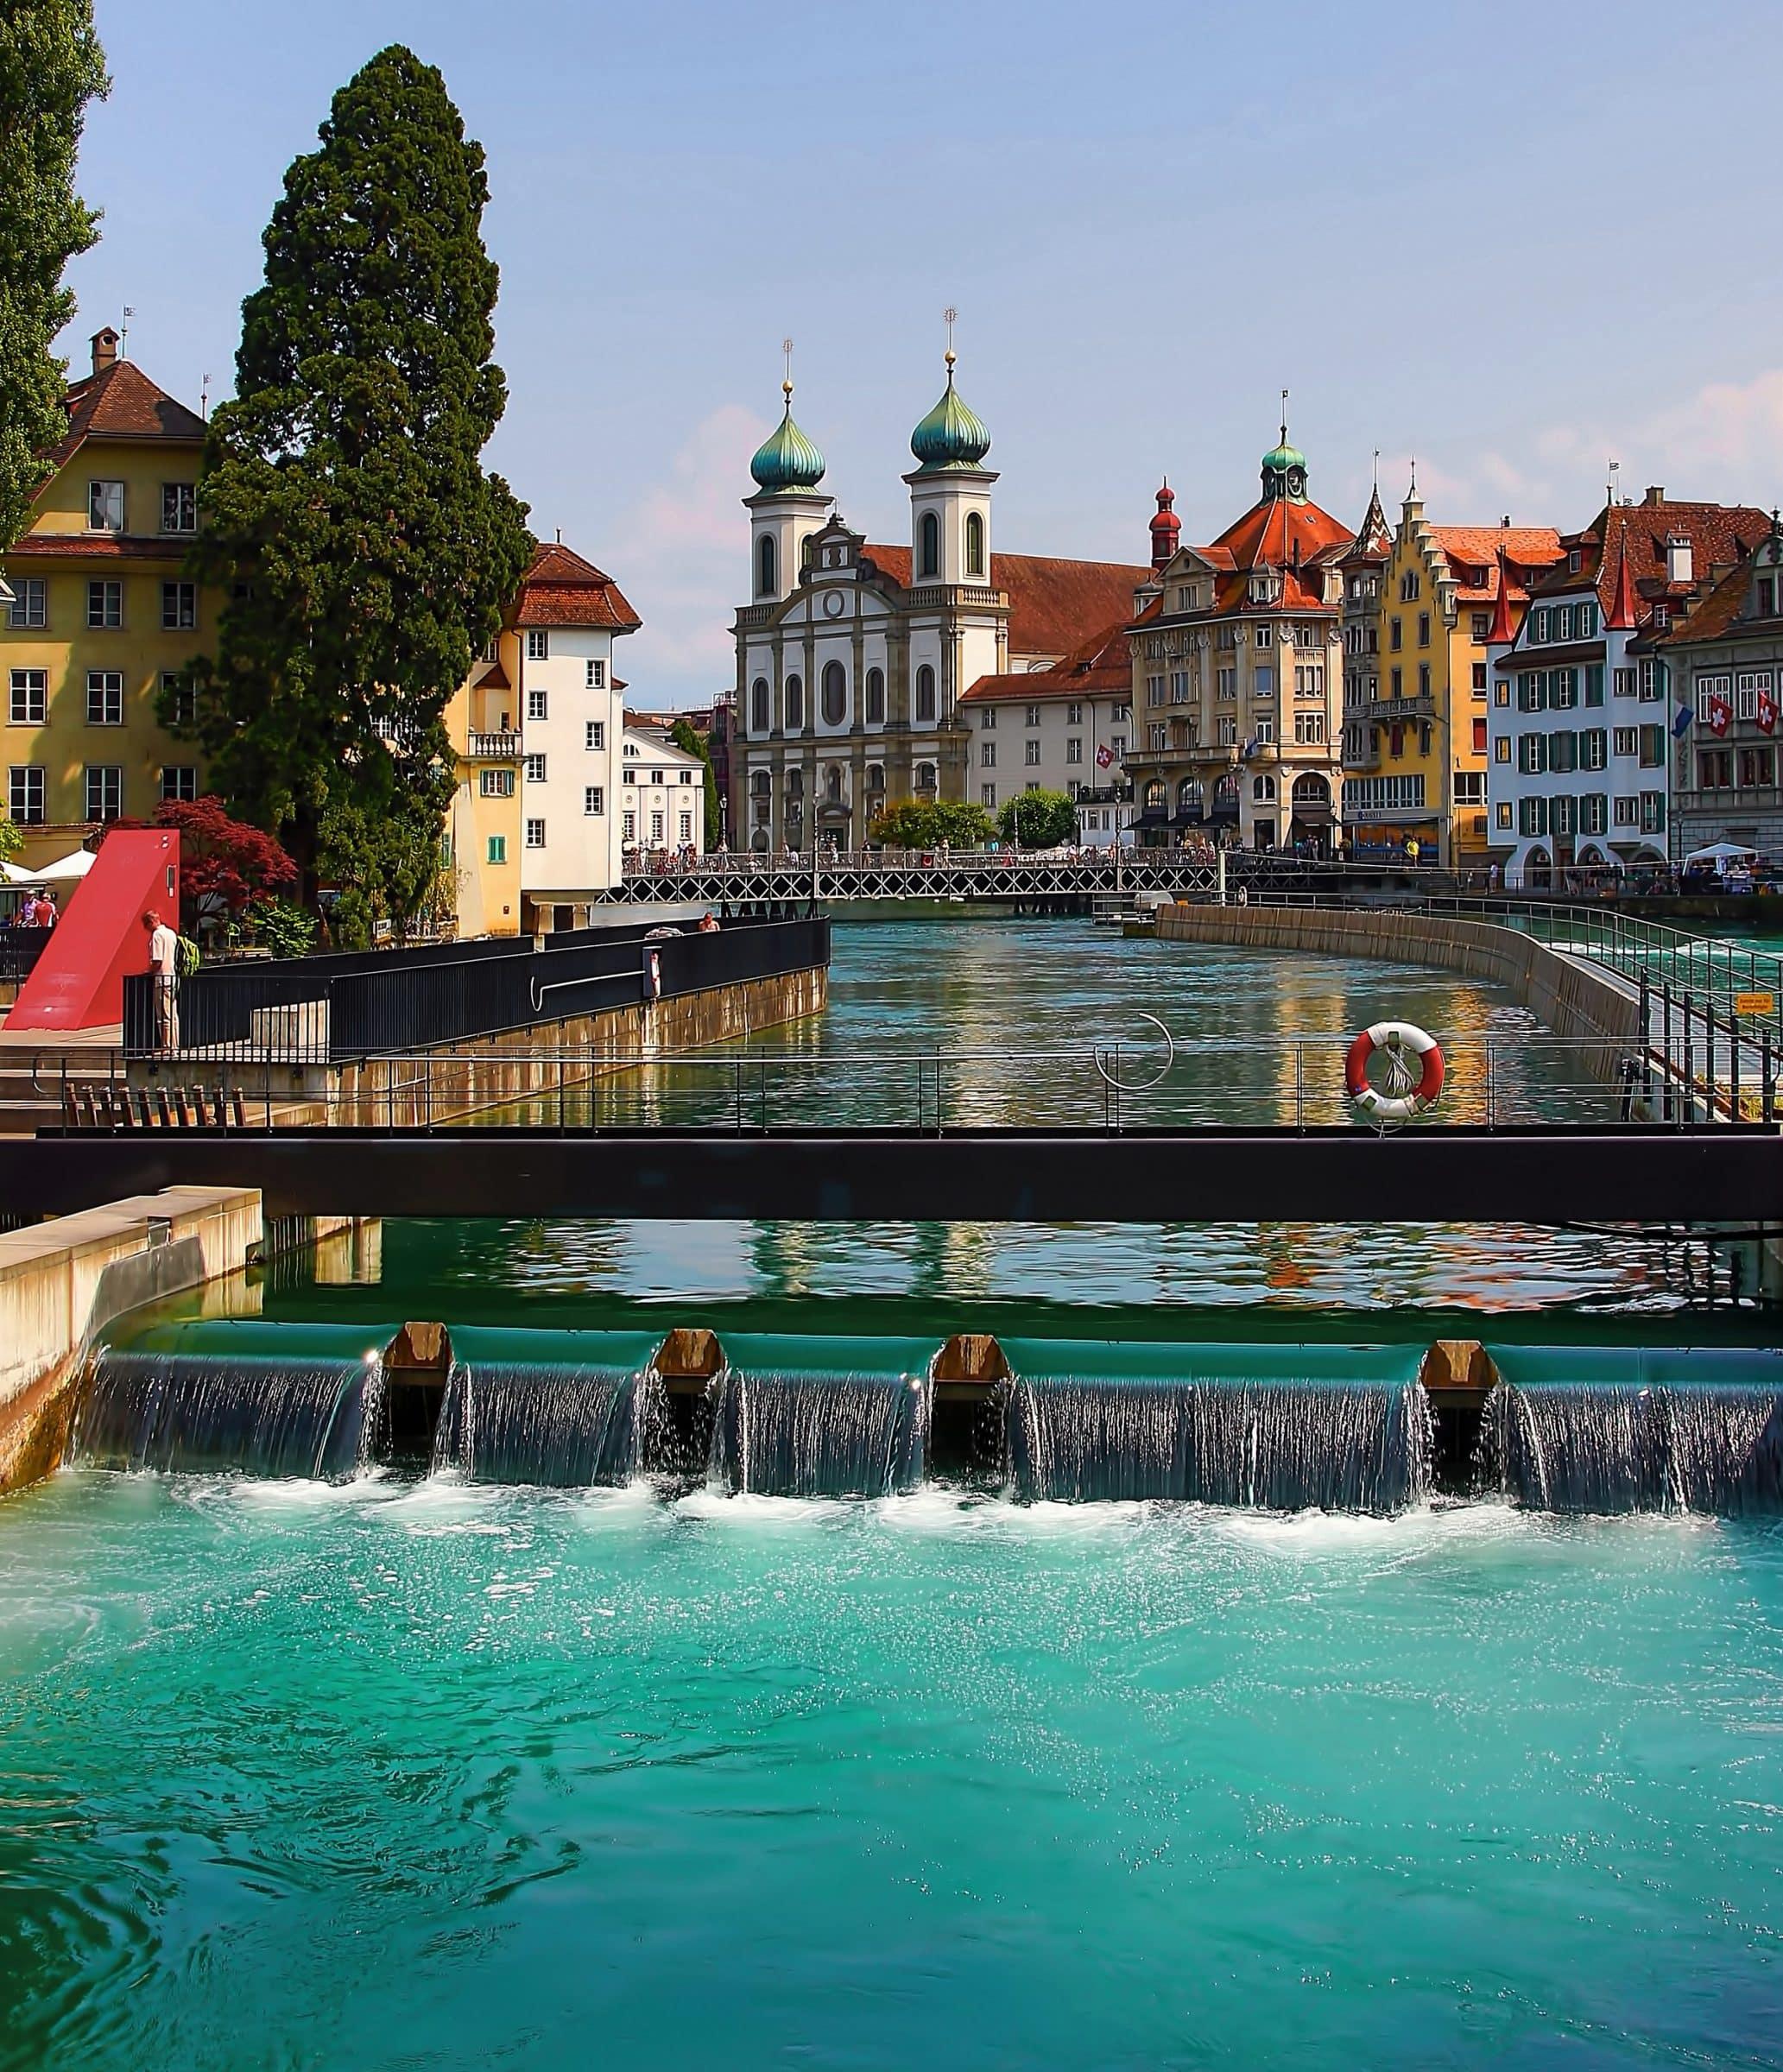 Luzern , Zwitserland. Een ongekend mooie stad in Europa.